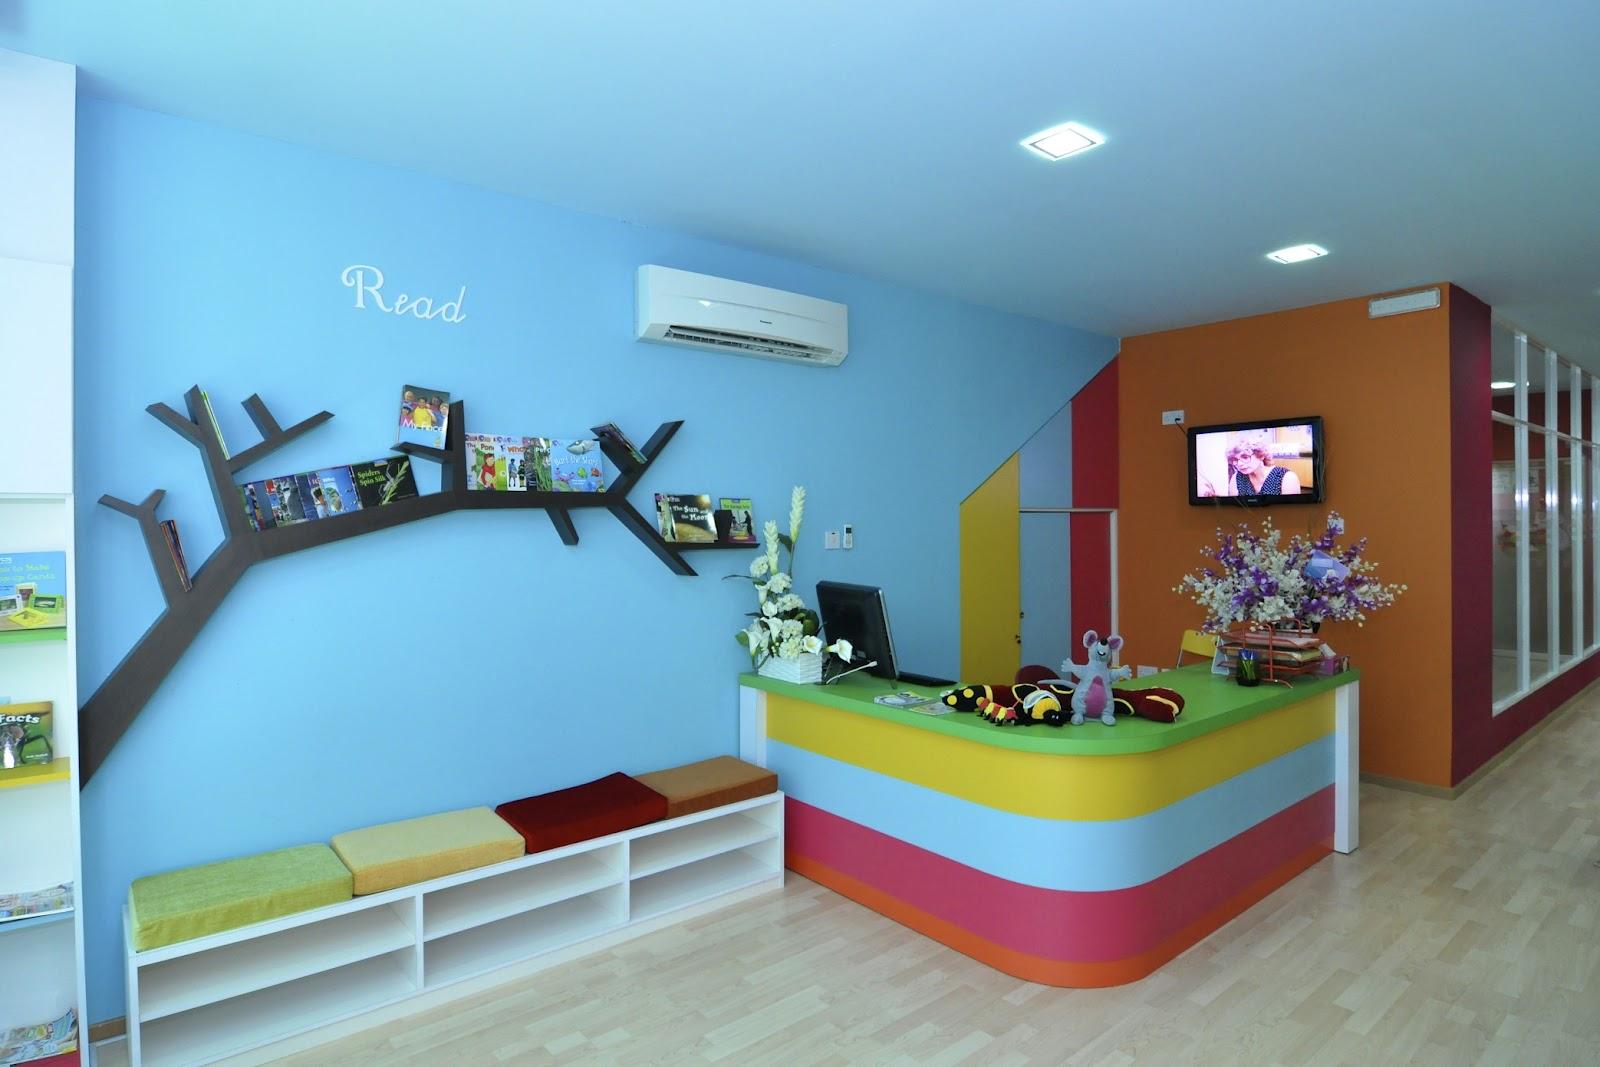 Tigerlim Jolly Language School